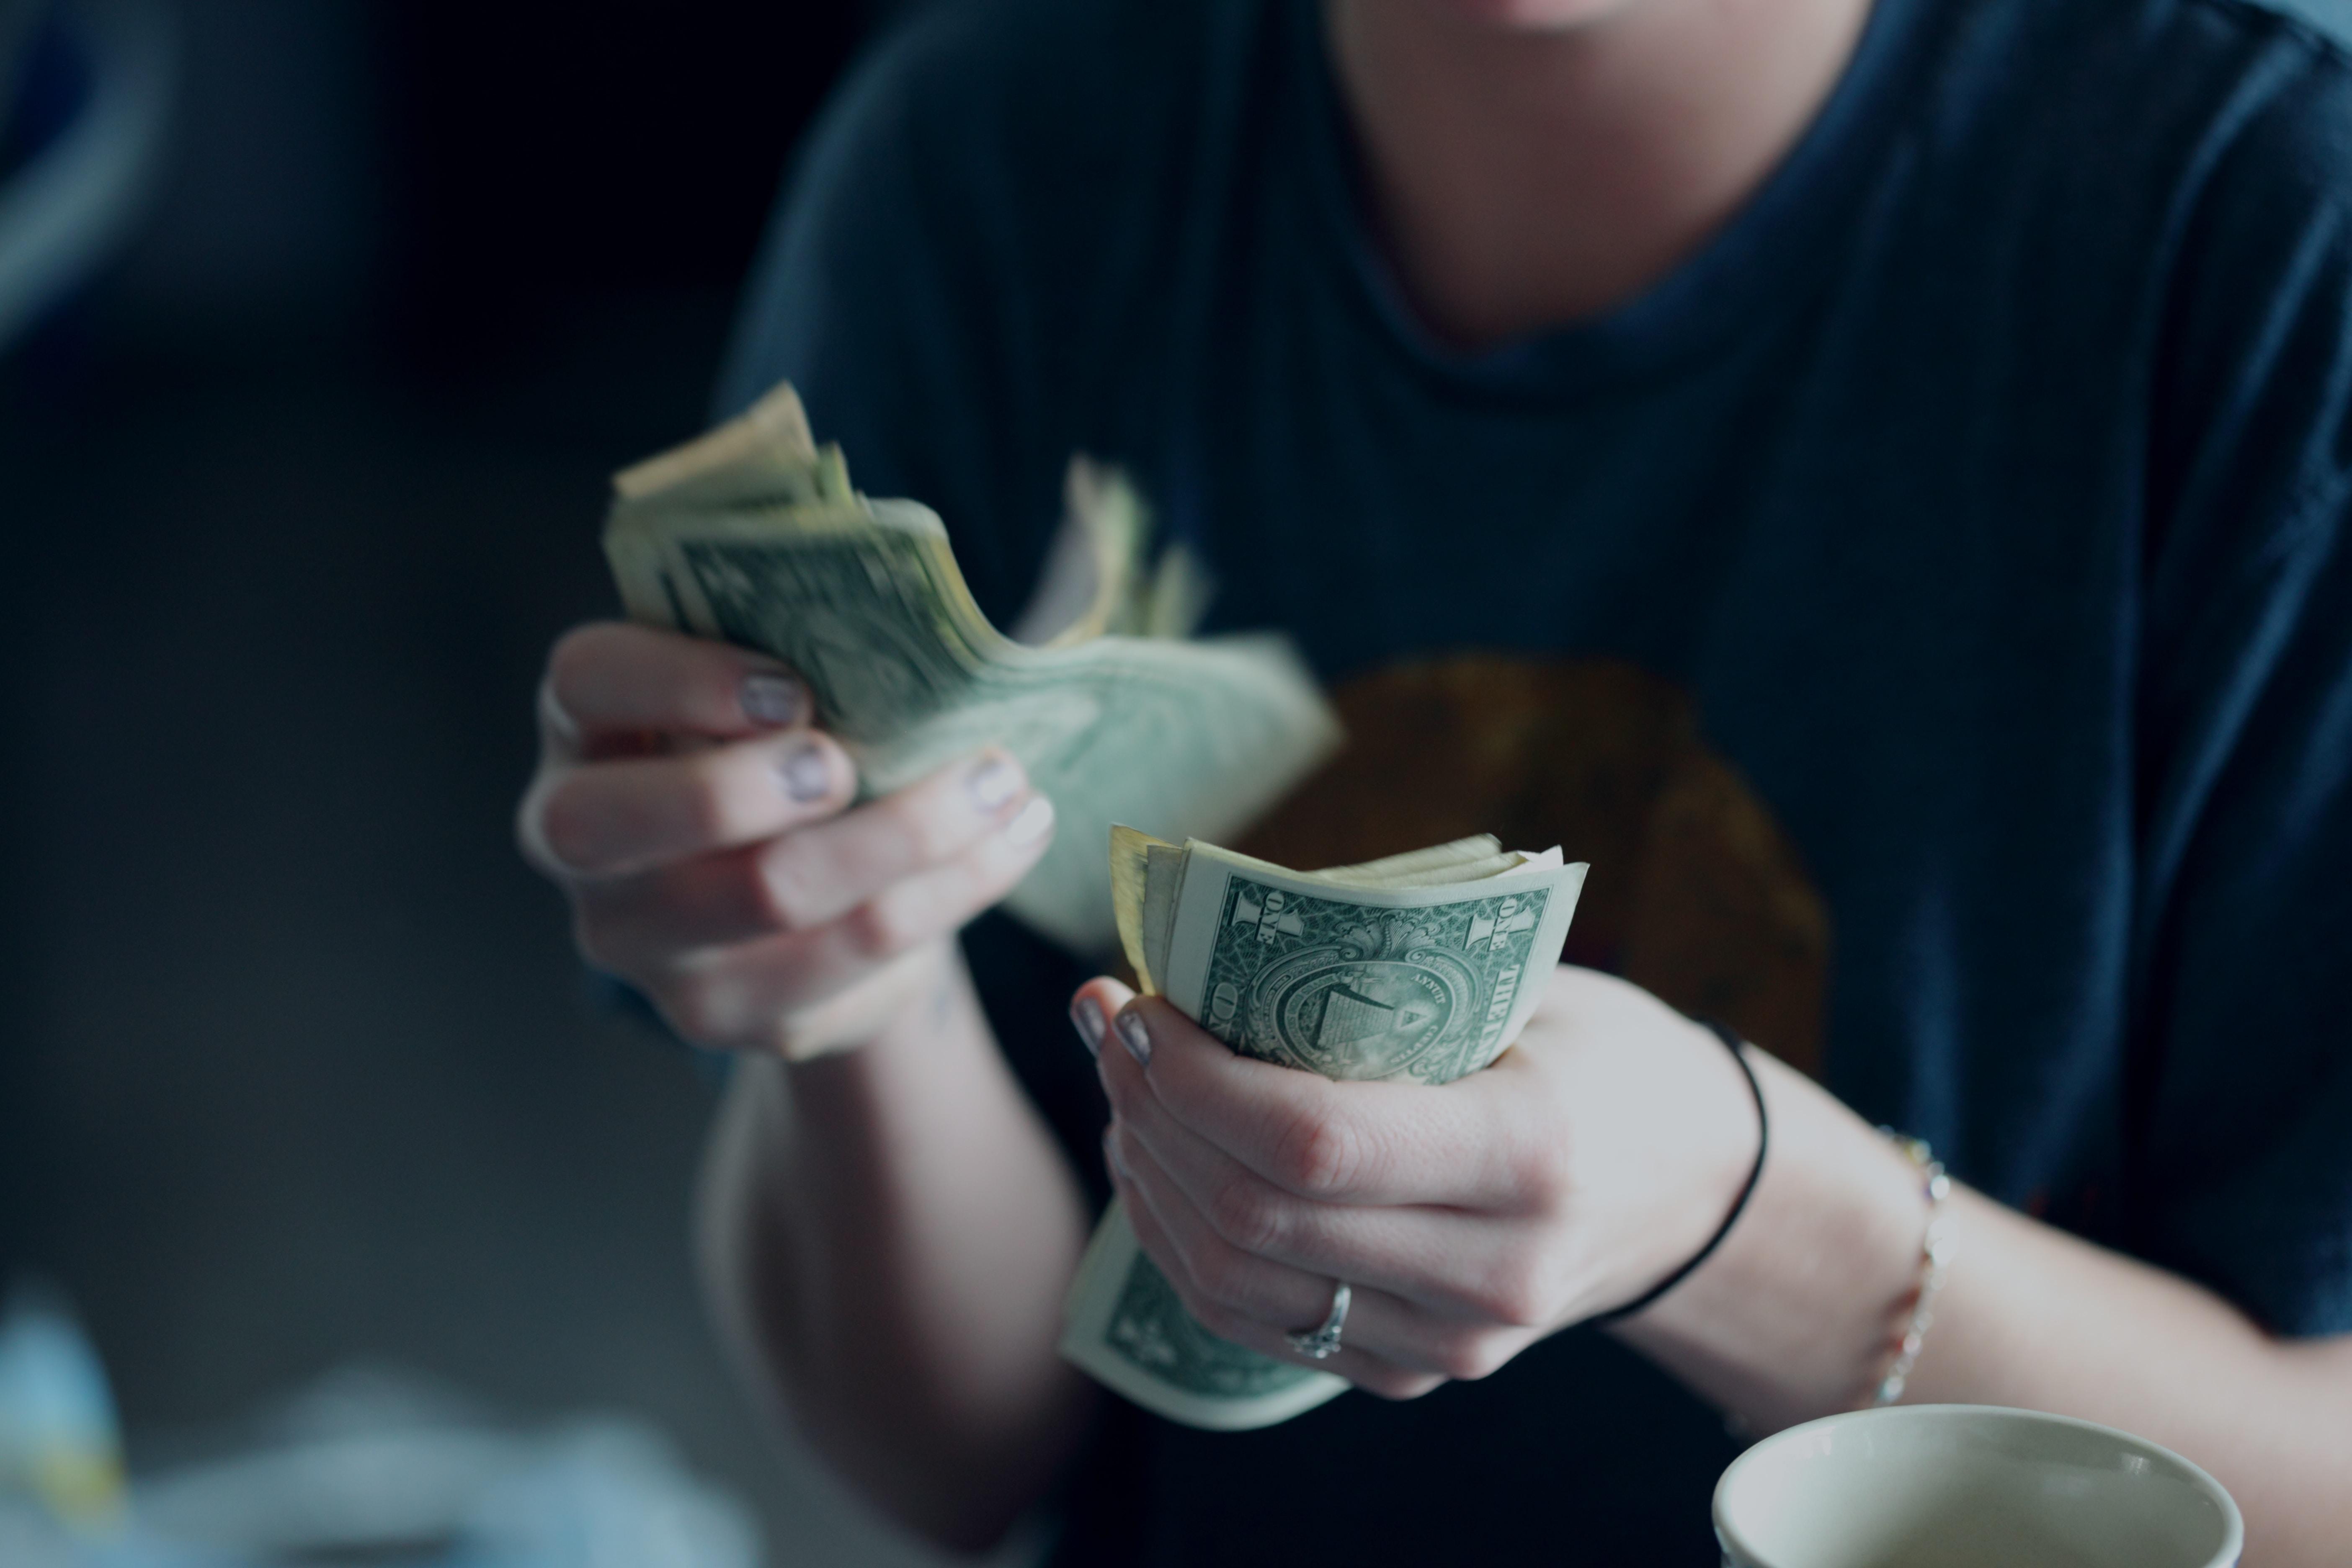 Miljonair of HAPPY miljonair